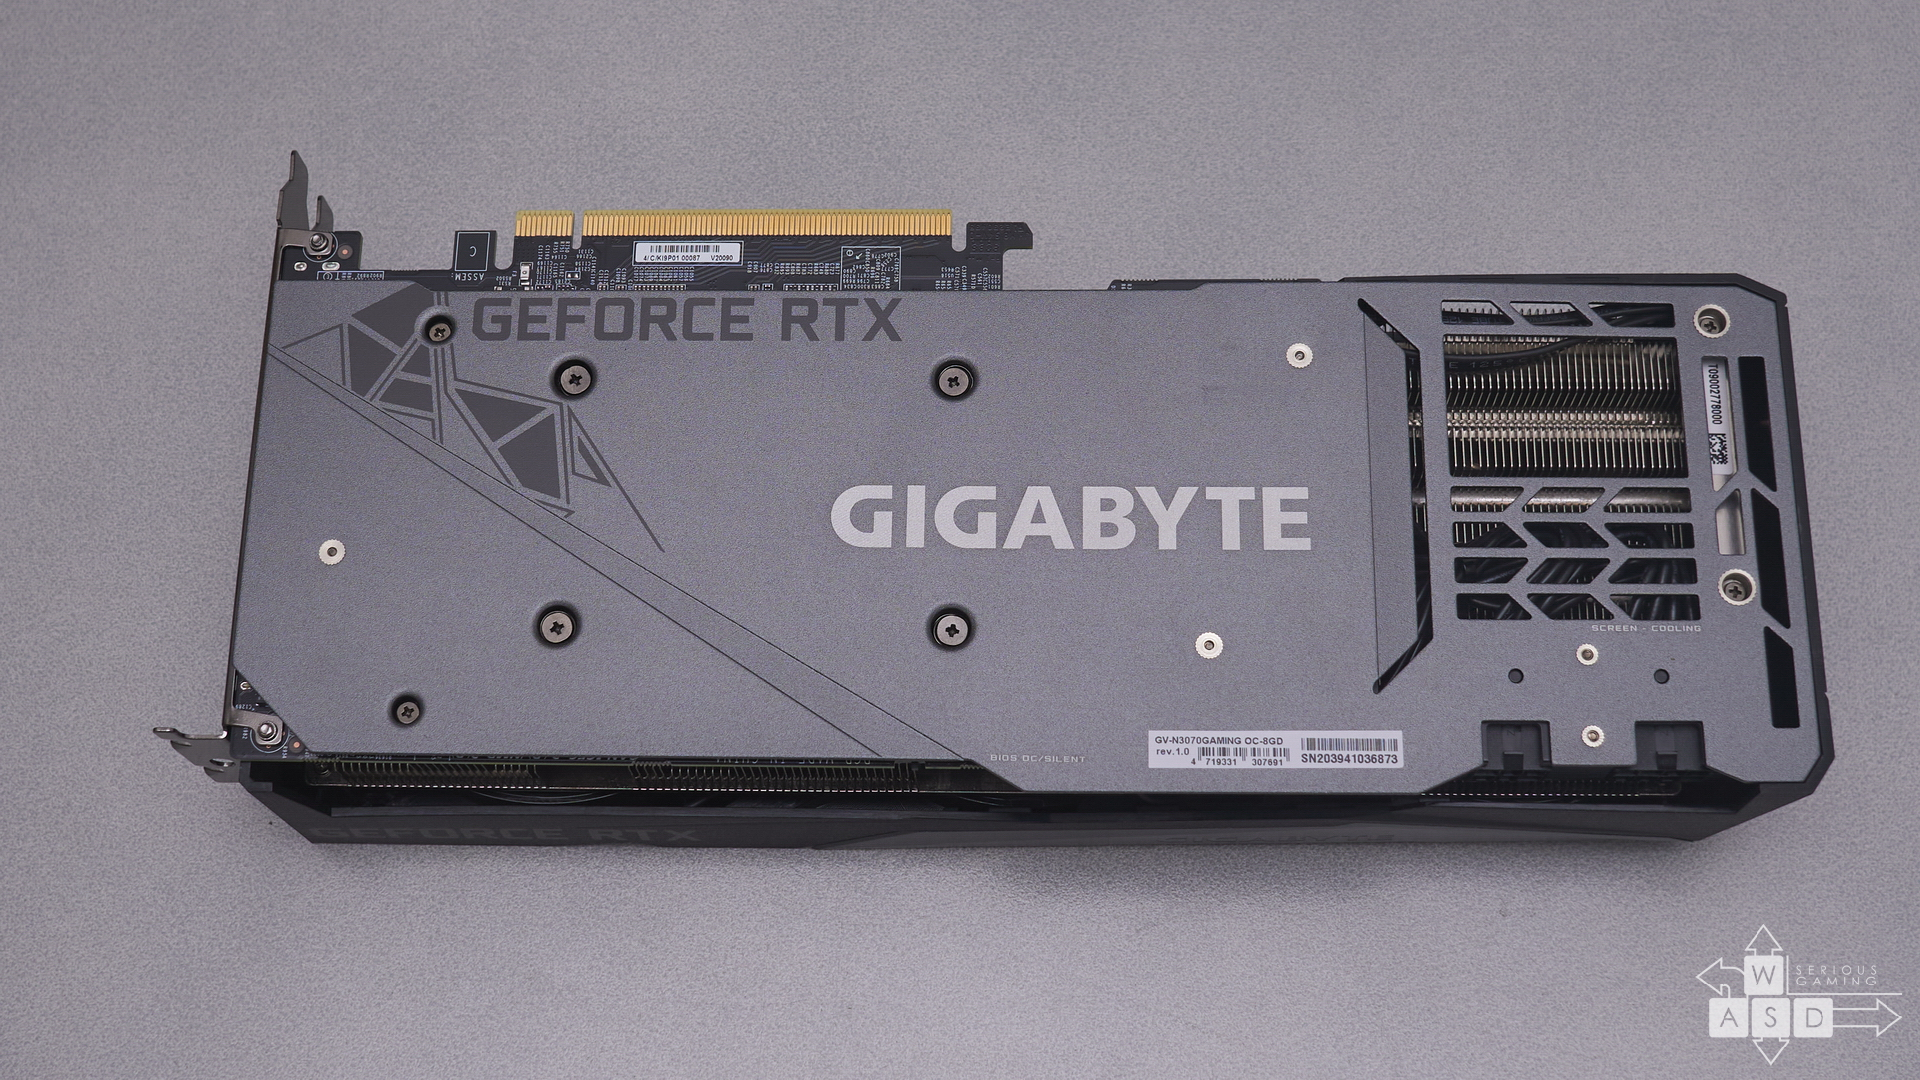 Gigabyte GeForce RTX 3070 Gaming OC 8G review | WASD